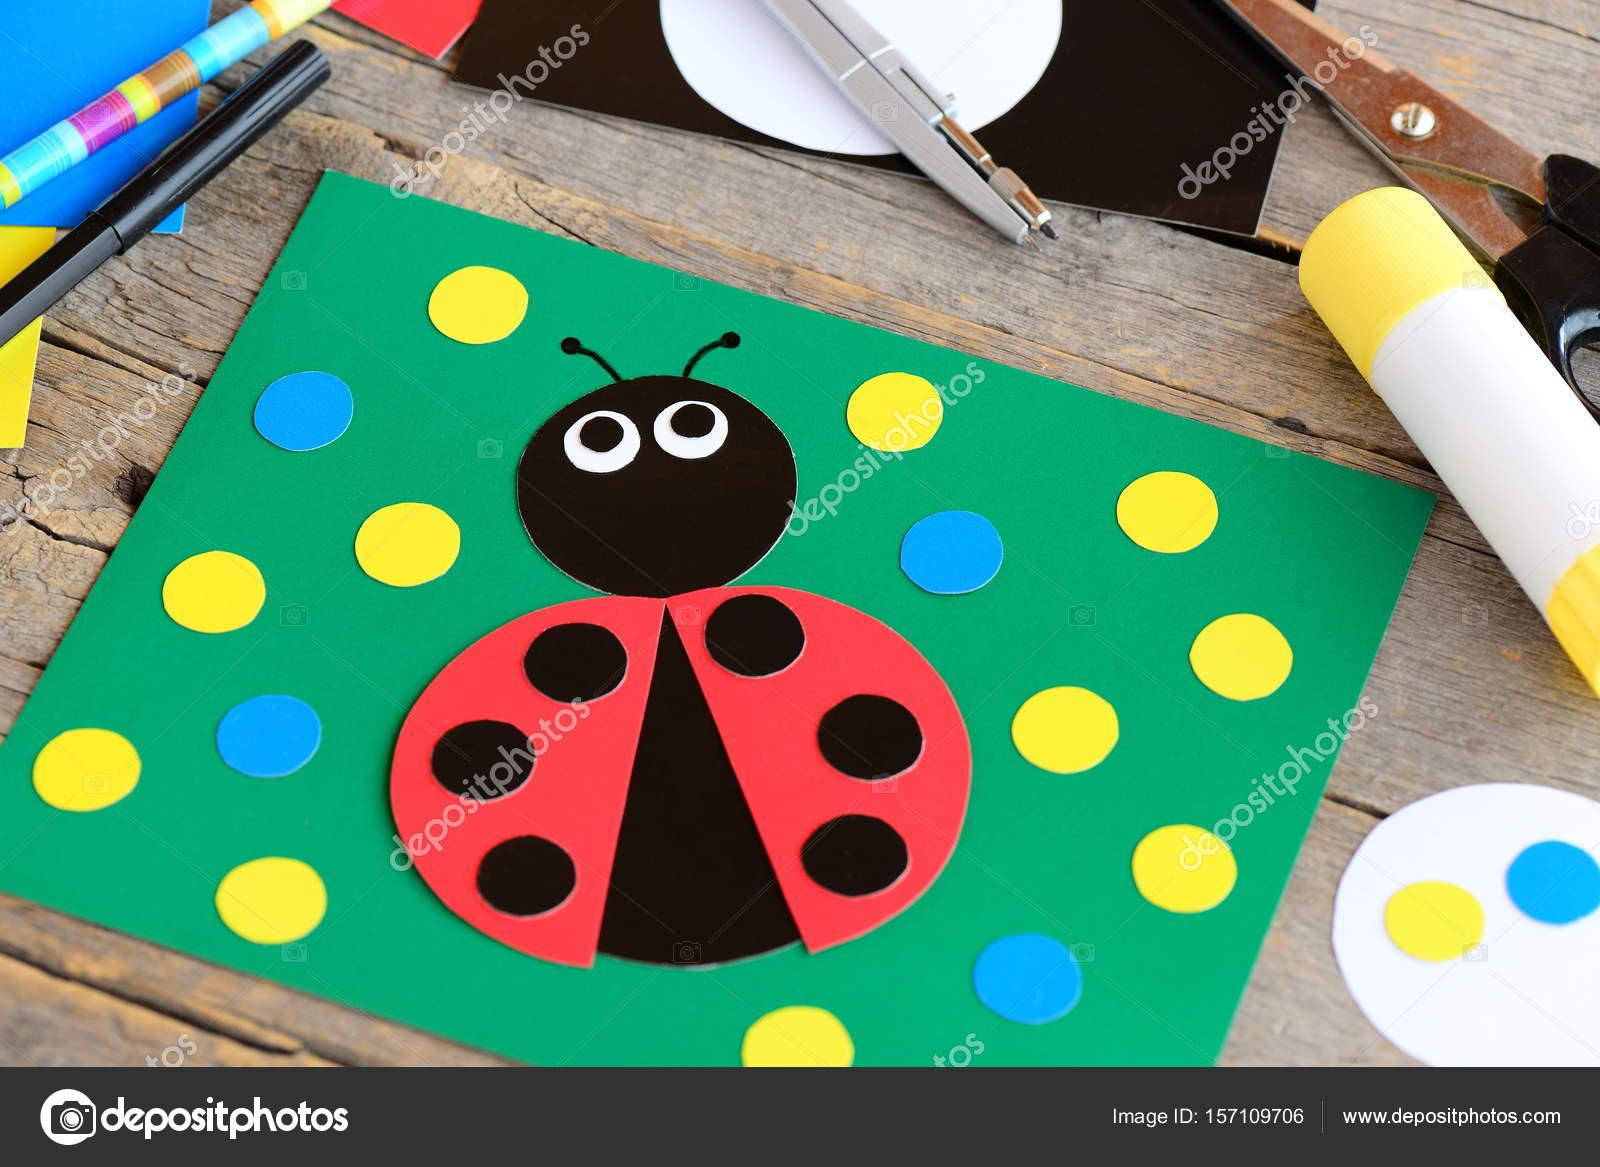 Cute Ladybug Cardboard Card Green Card With Ladybug Made From